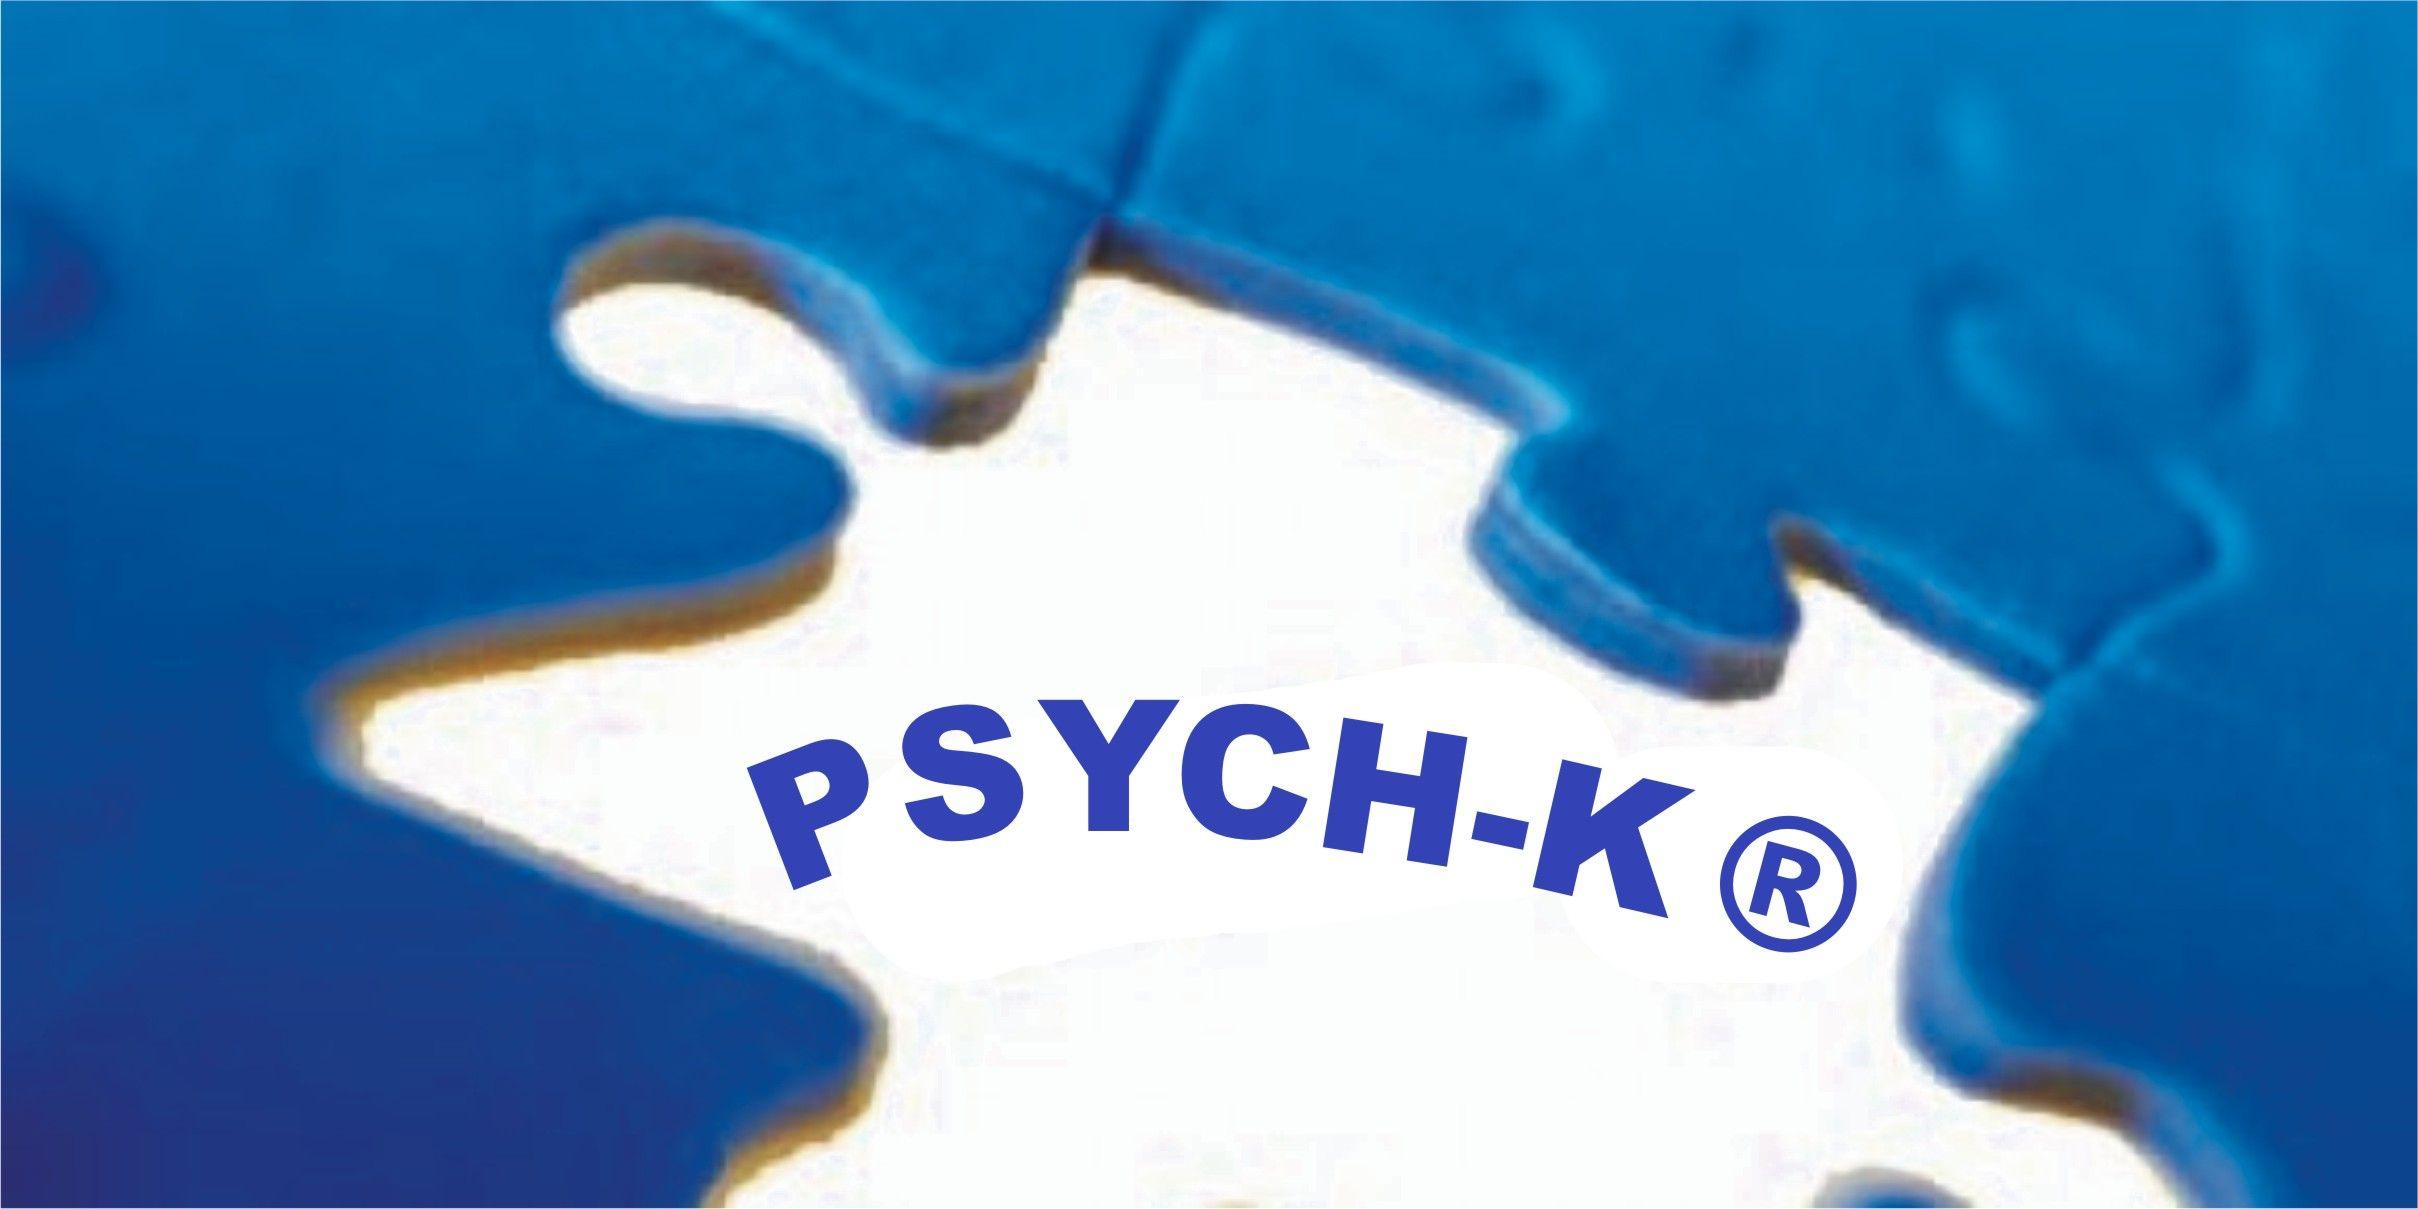 PSYCH-K puzzle